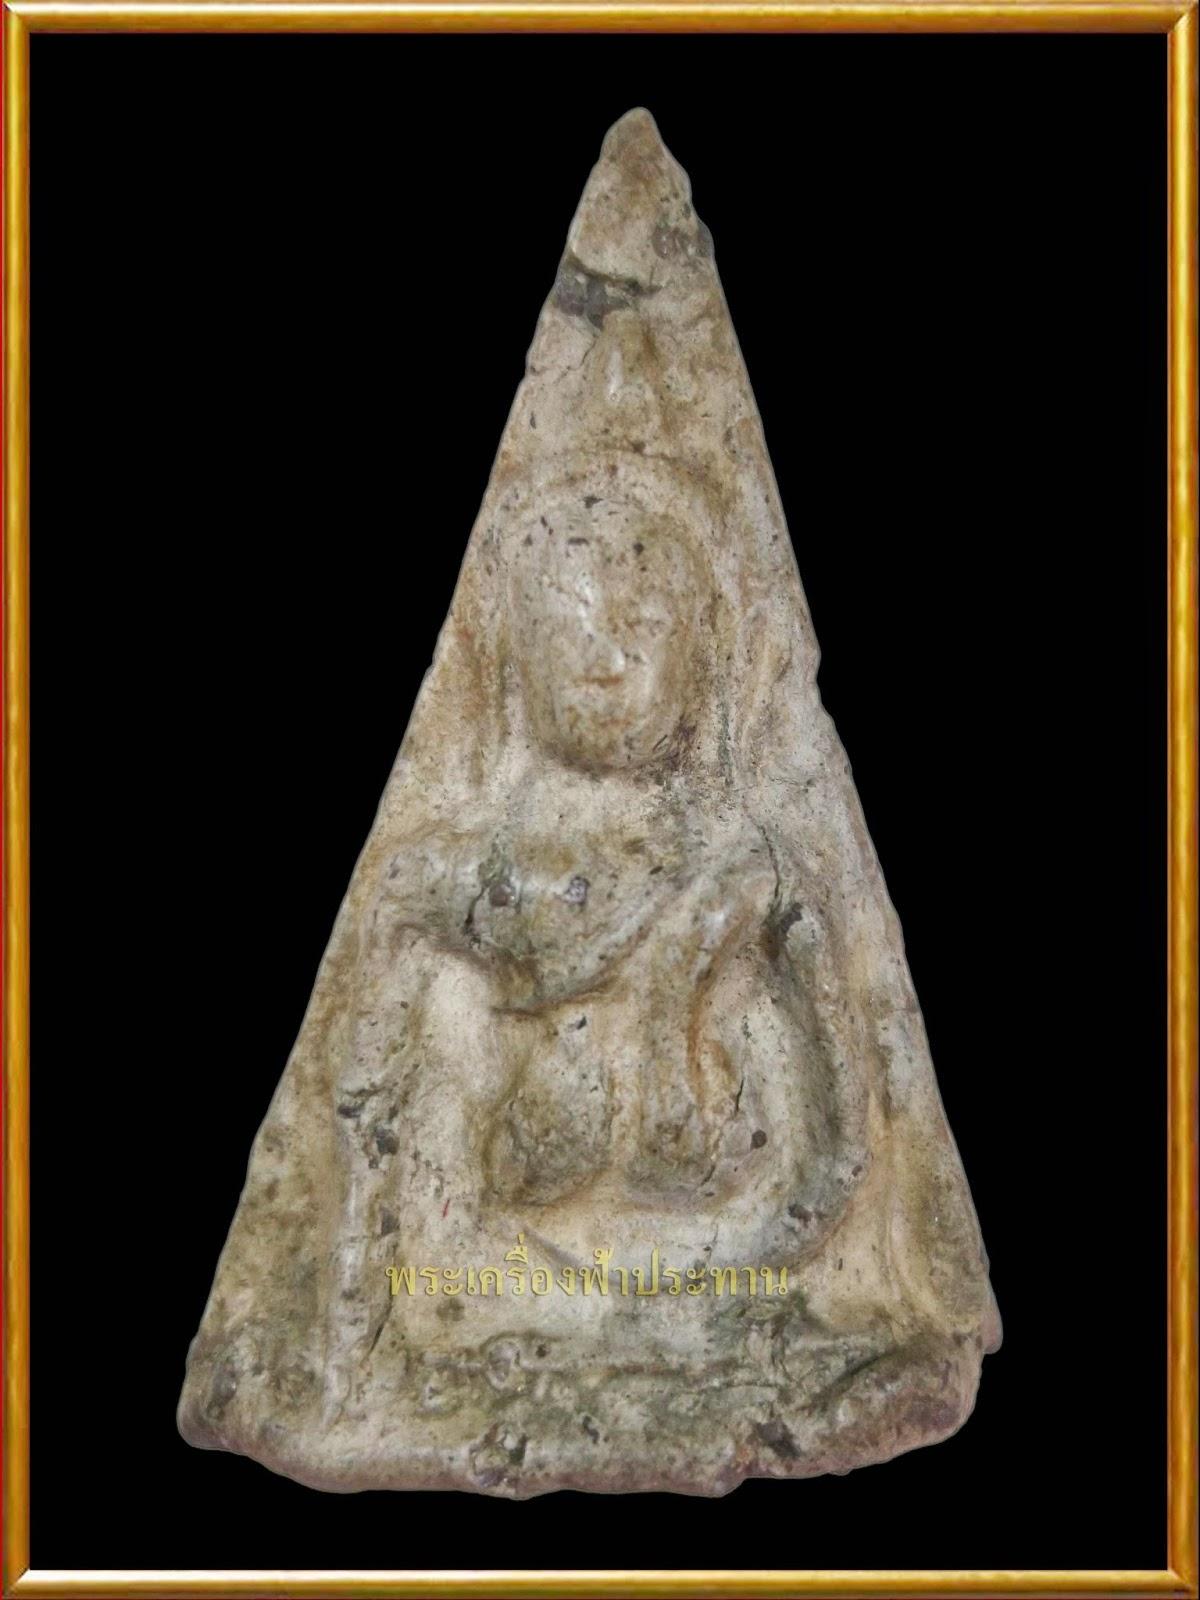 http://tubtimthong-amulet.blogspot.com/2014/06/blog-post_9620.html